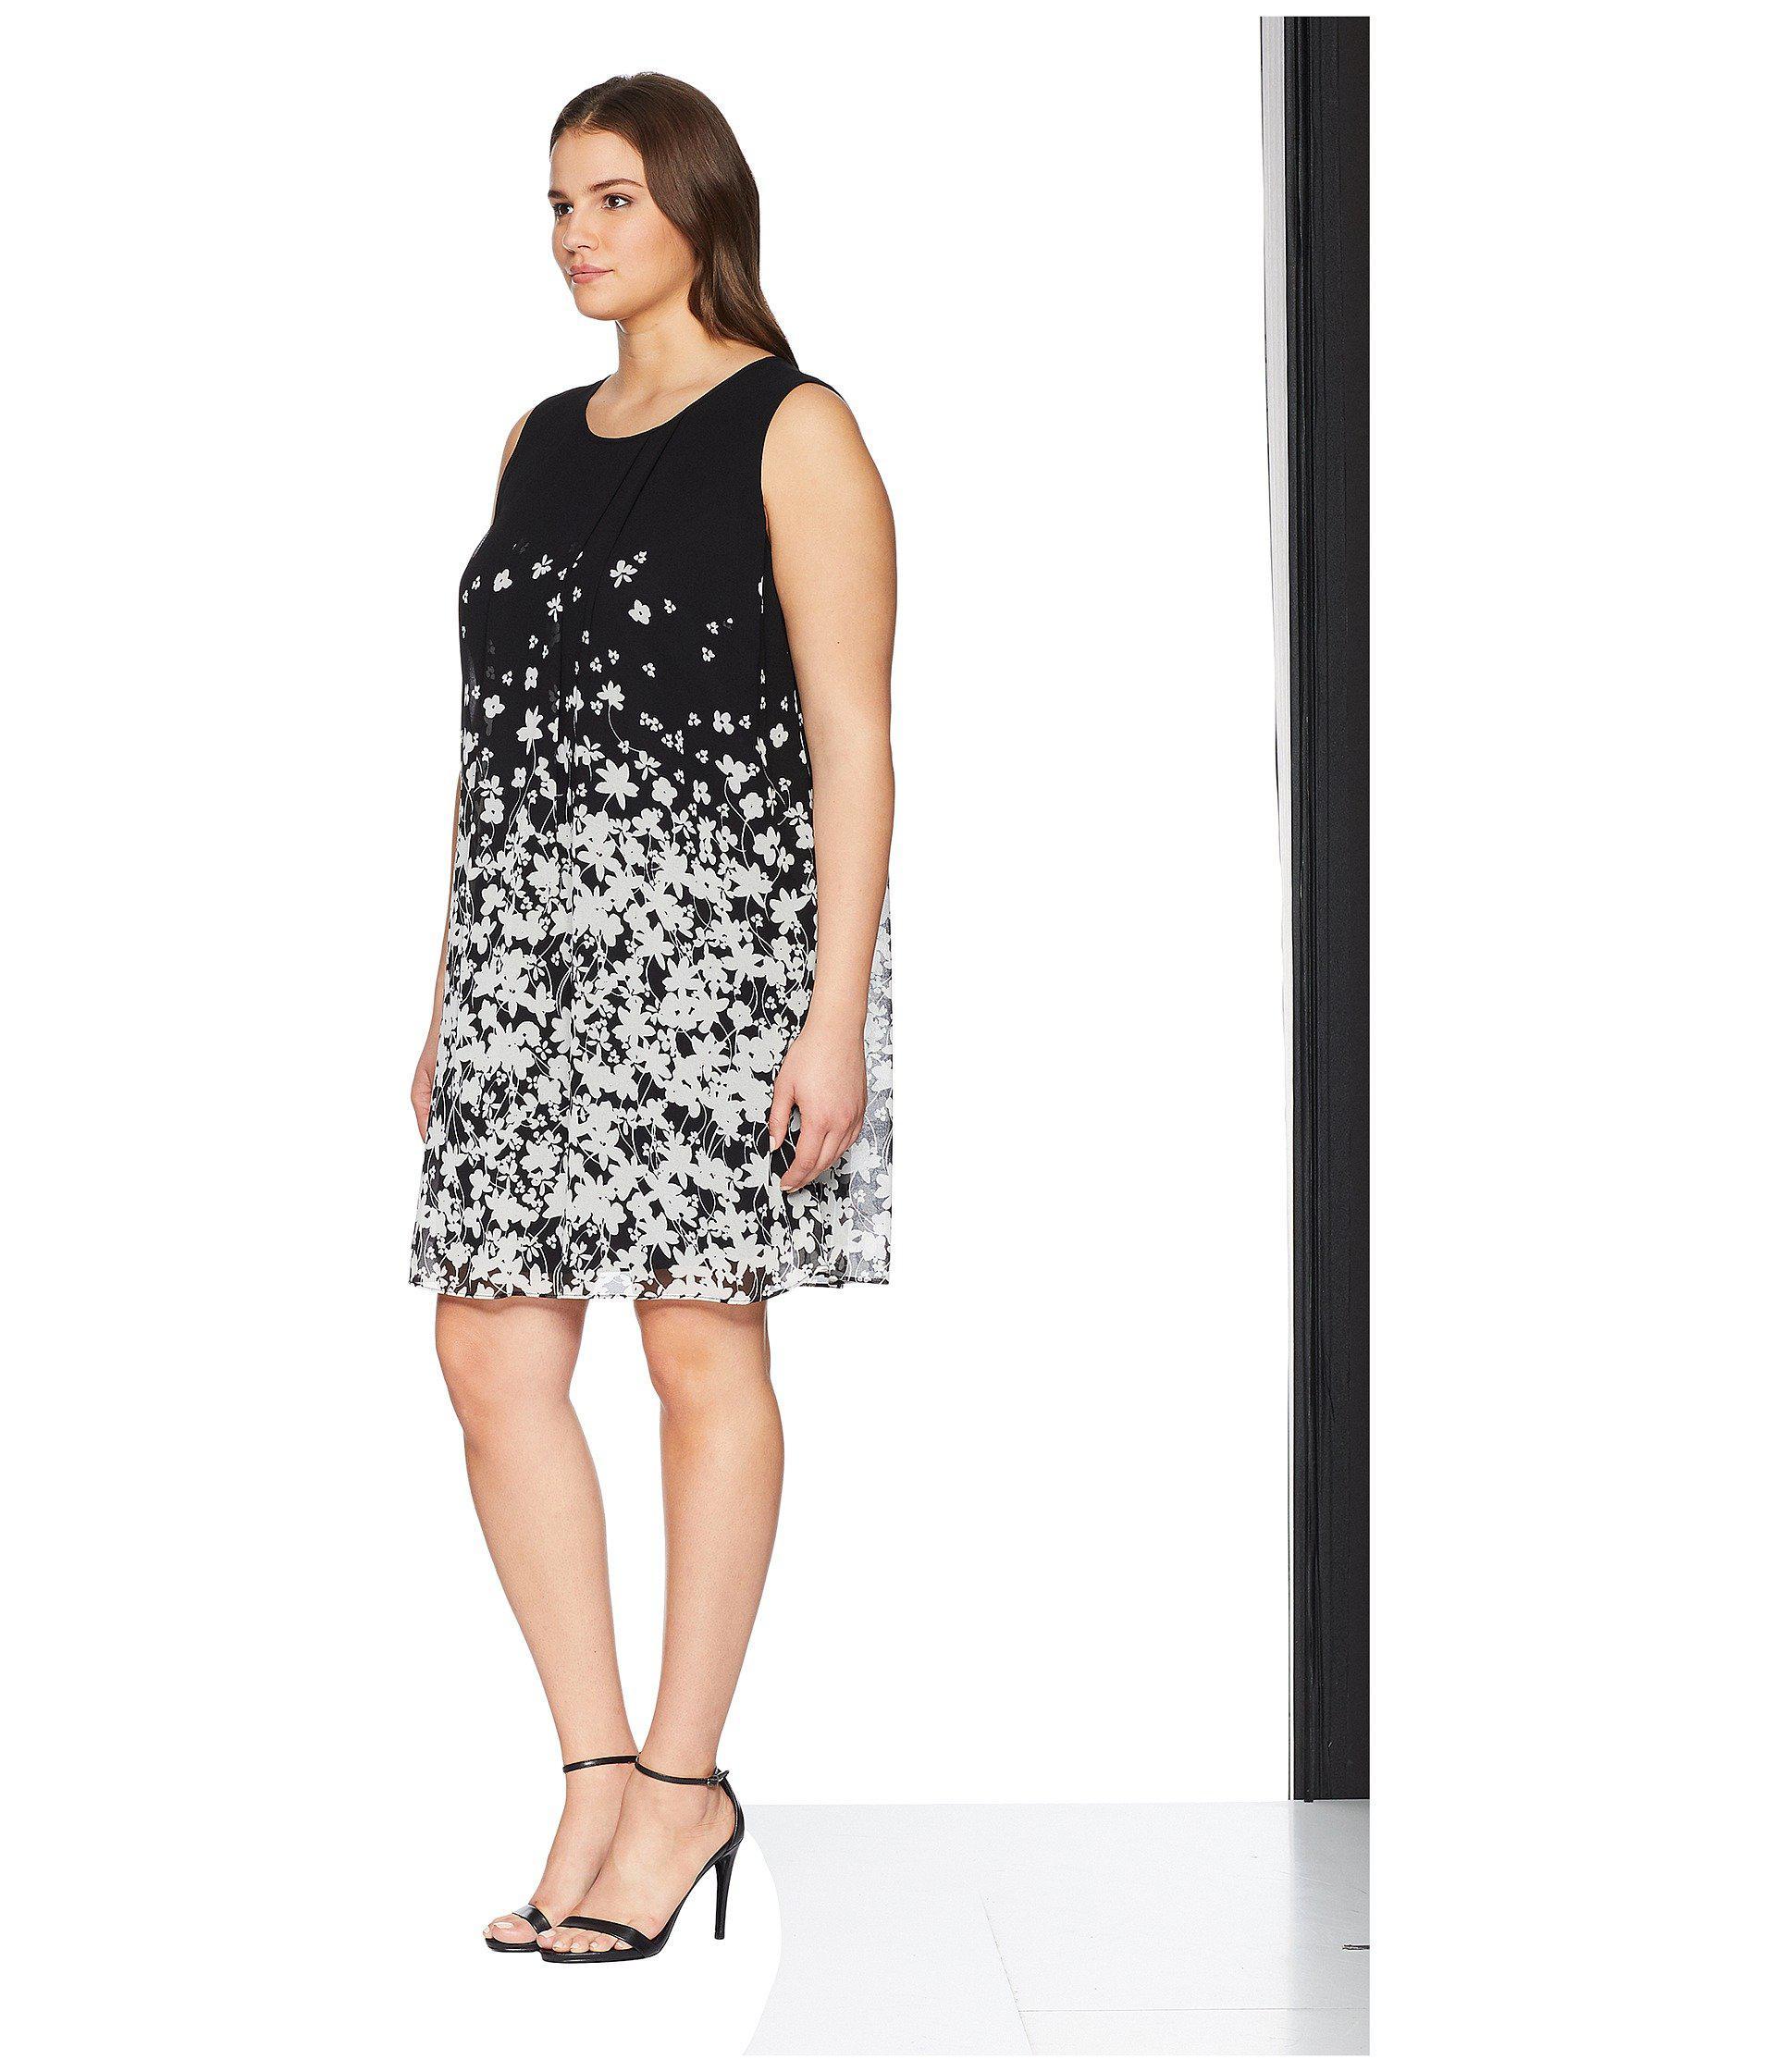 081fcc0e Lyst - Calvin Klein Plus Size Printed Sleeveless A-line Dress in Black -  Save 32%